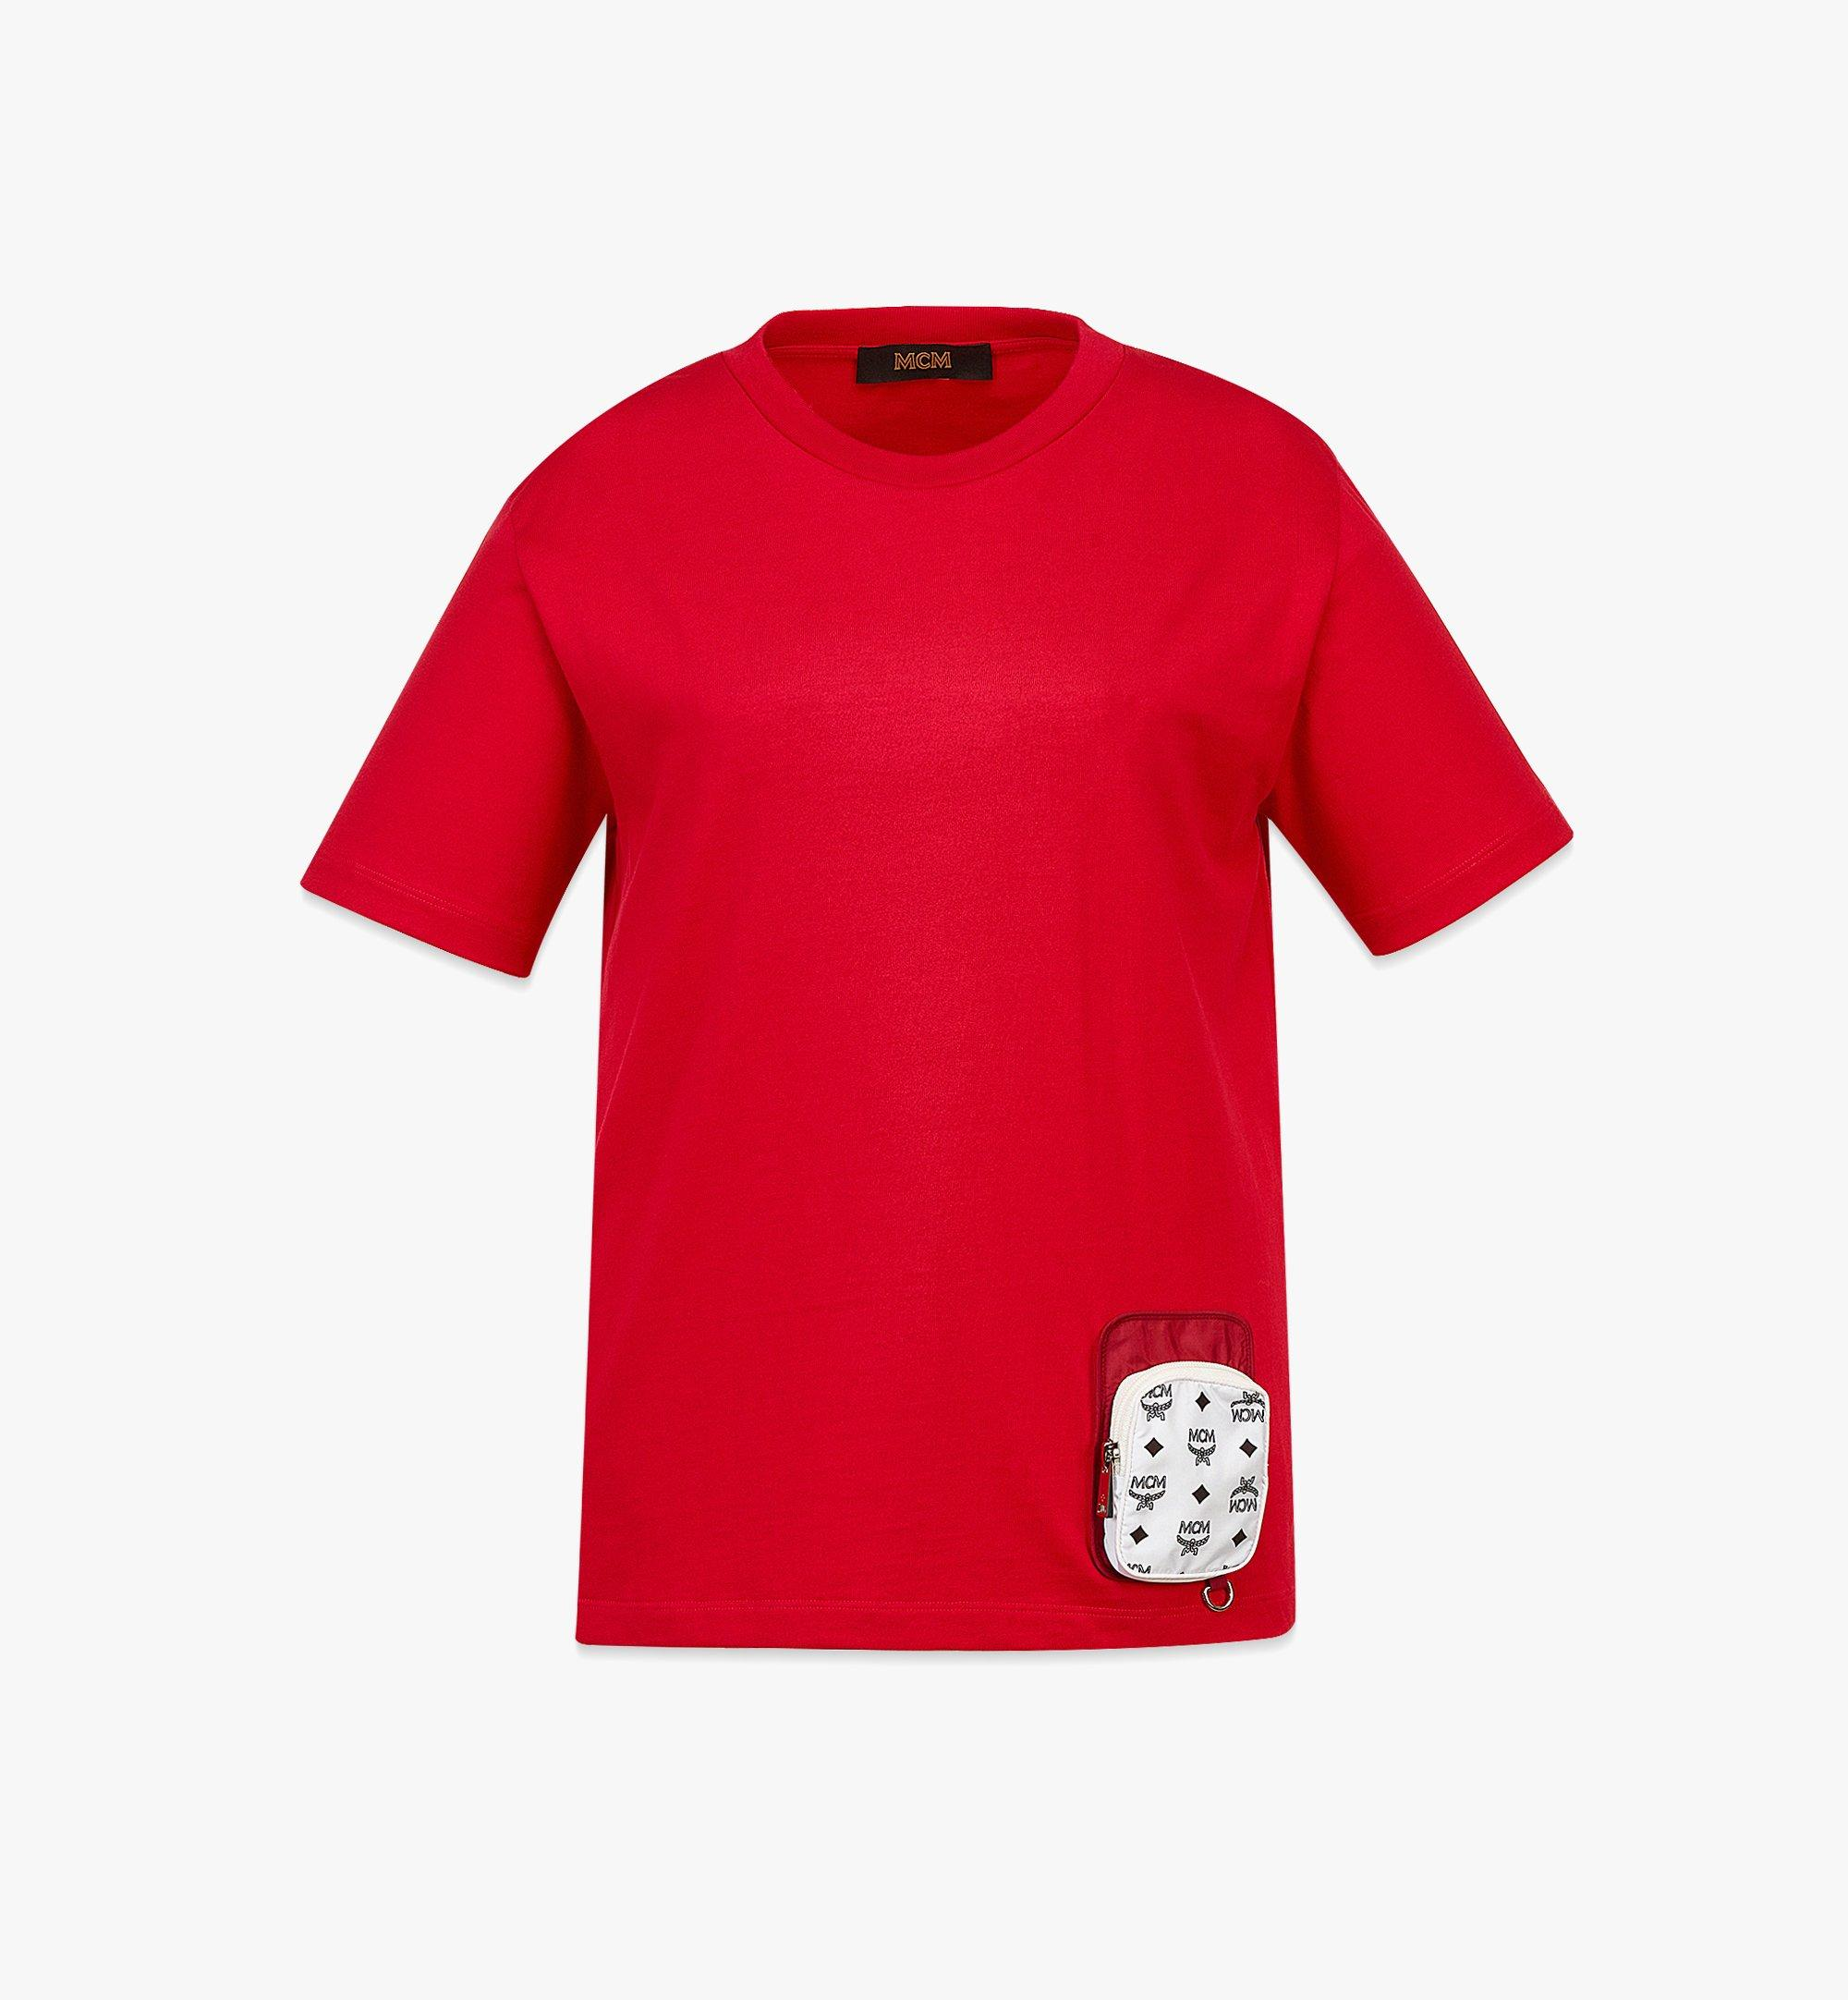 MCM Women's Organic Cotton T-Shirt with Nylon Zip Pocket Red MFTBAMM02R00XS Alternate View 1